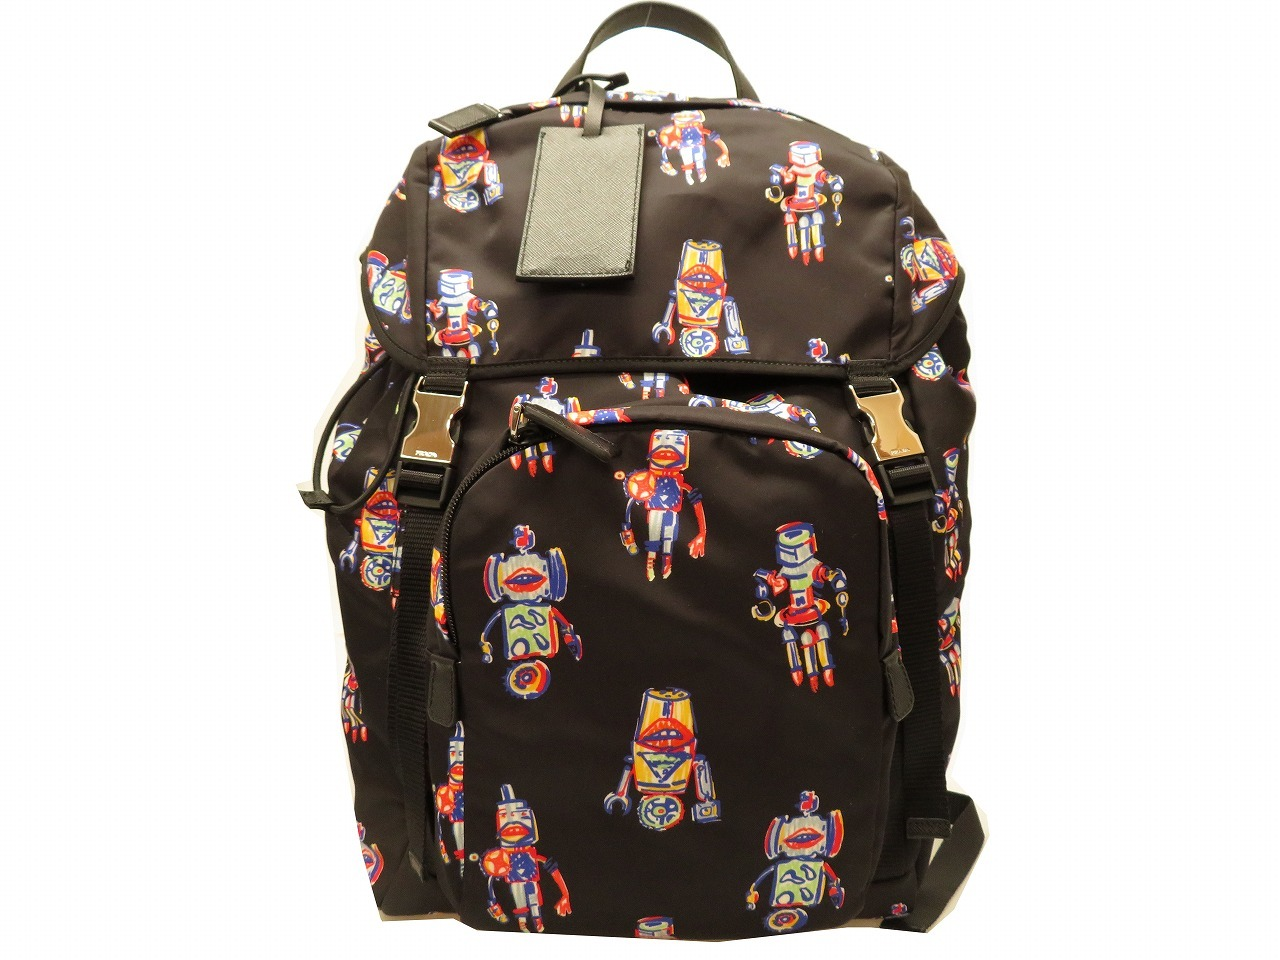 5ace71c53100 ... official store unused prada v135 nylon rucksack bag robot men black bag  0052prada 18657 37638